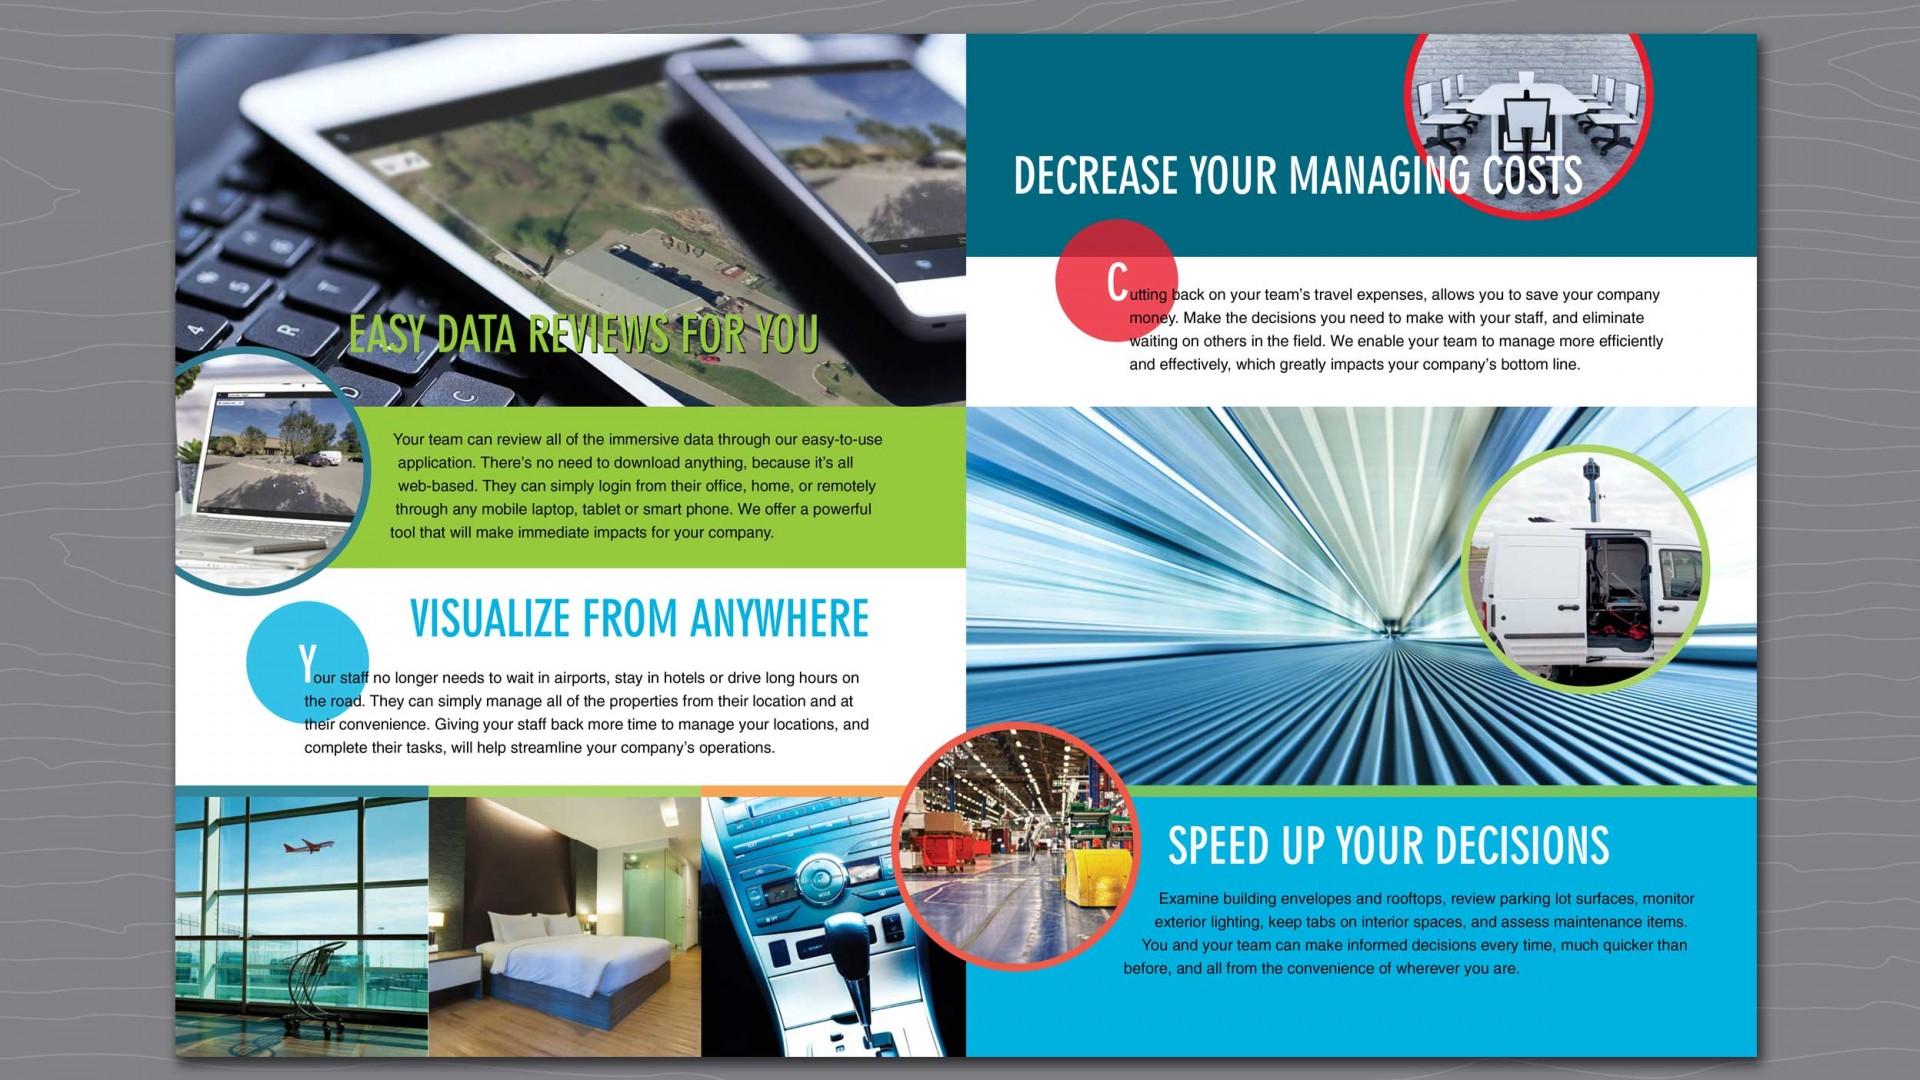 IDS capabilities brochure second interior spread.